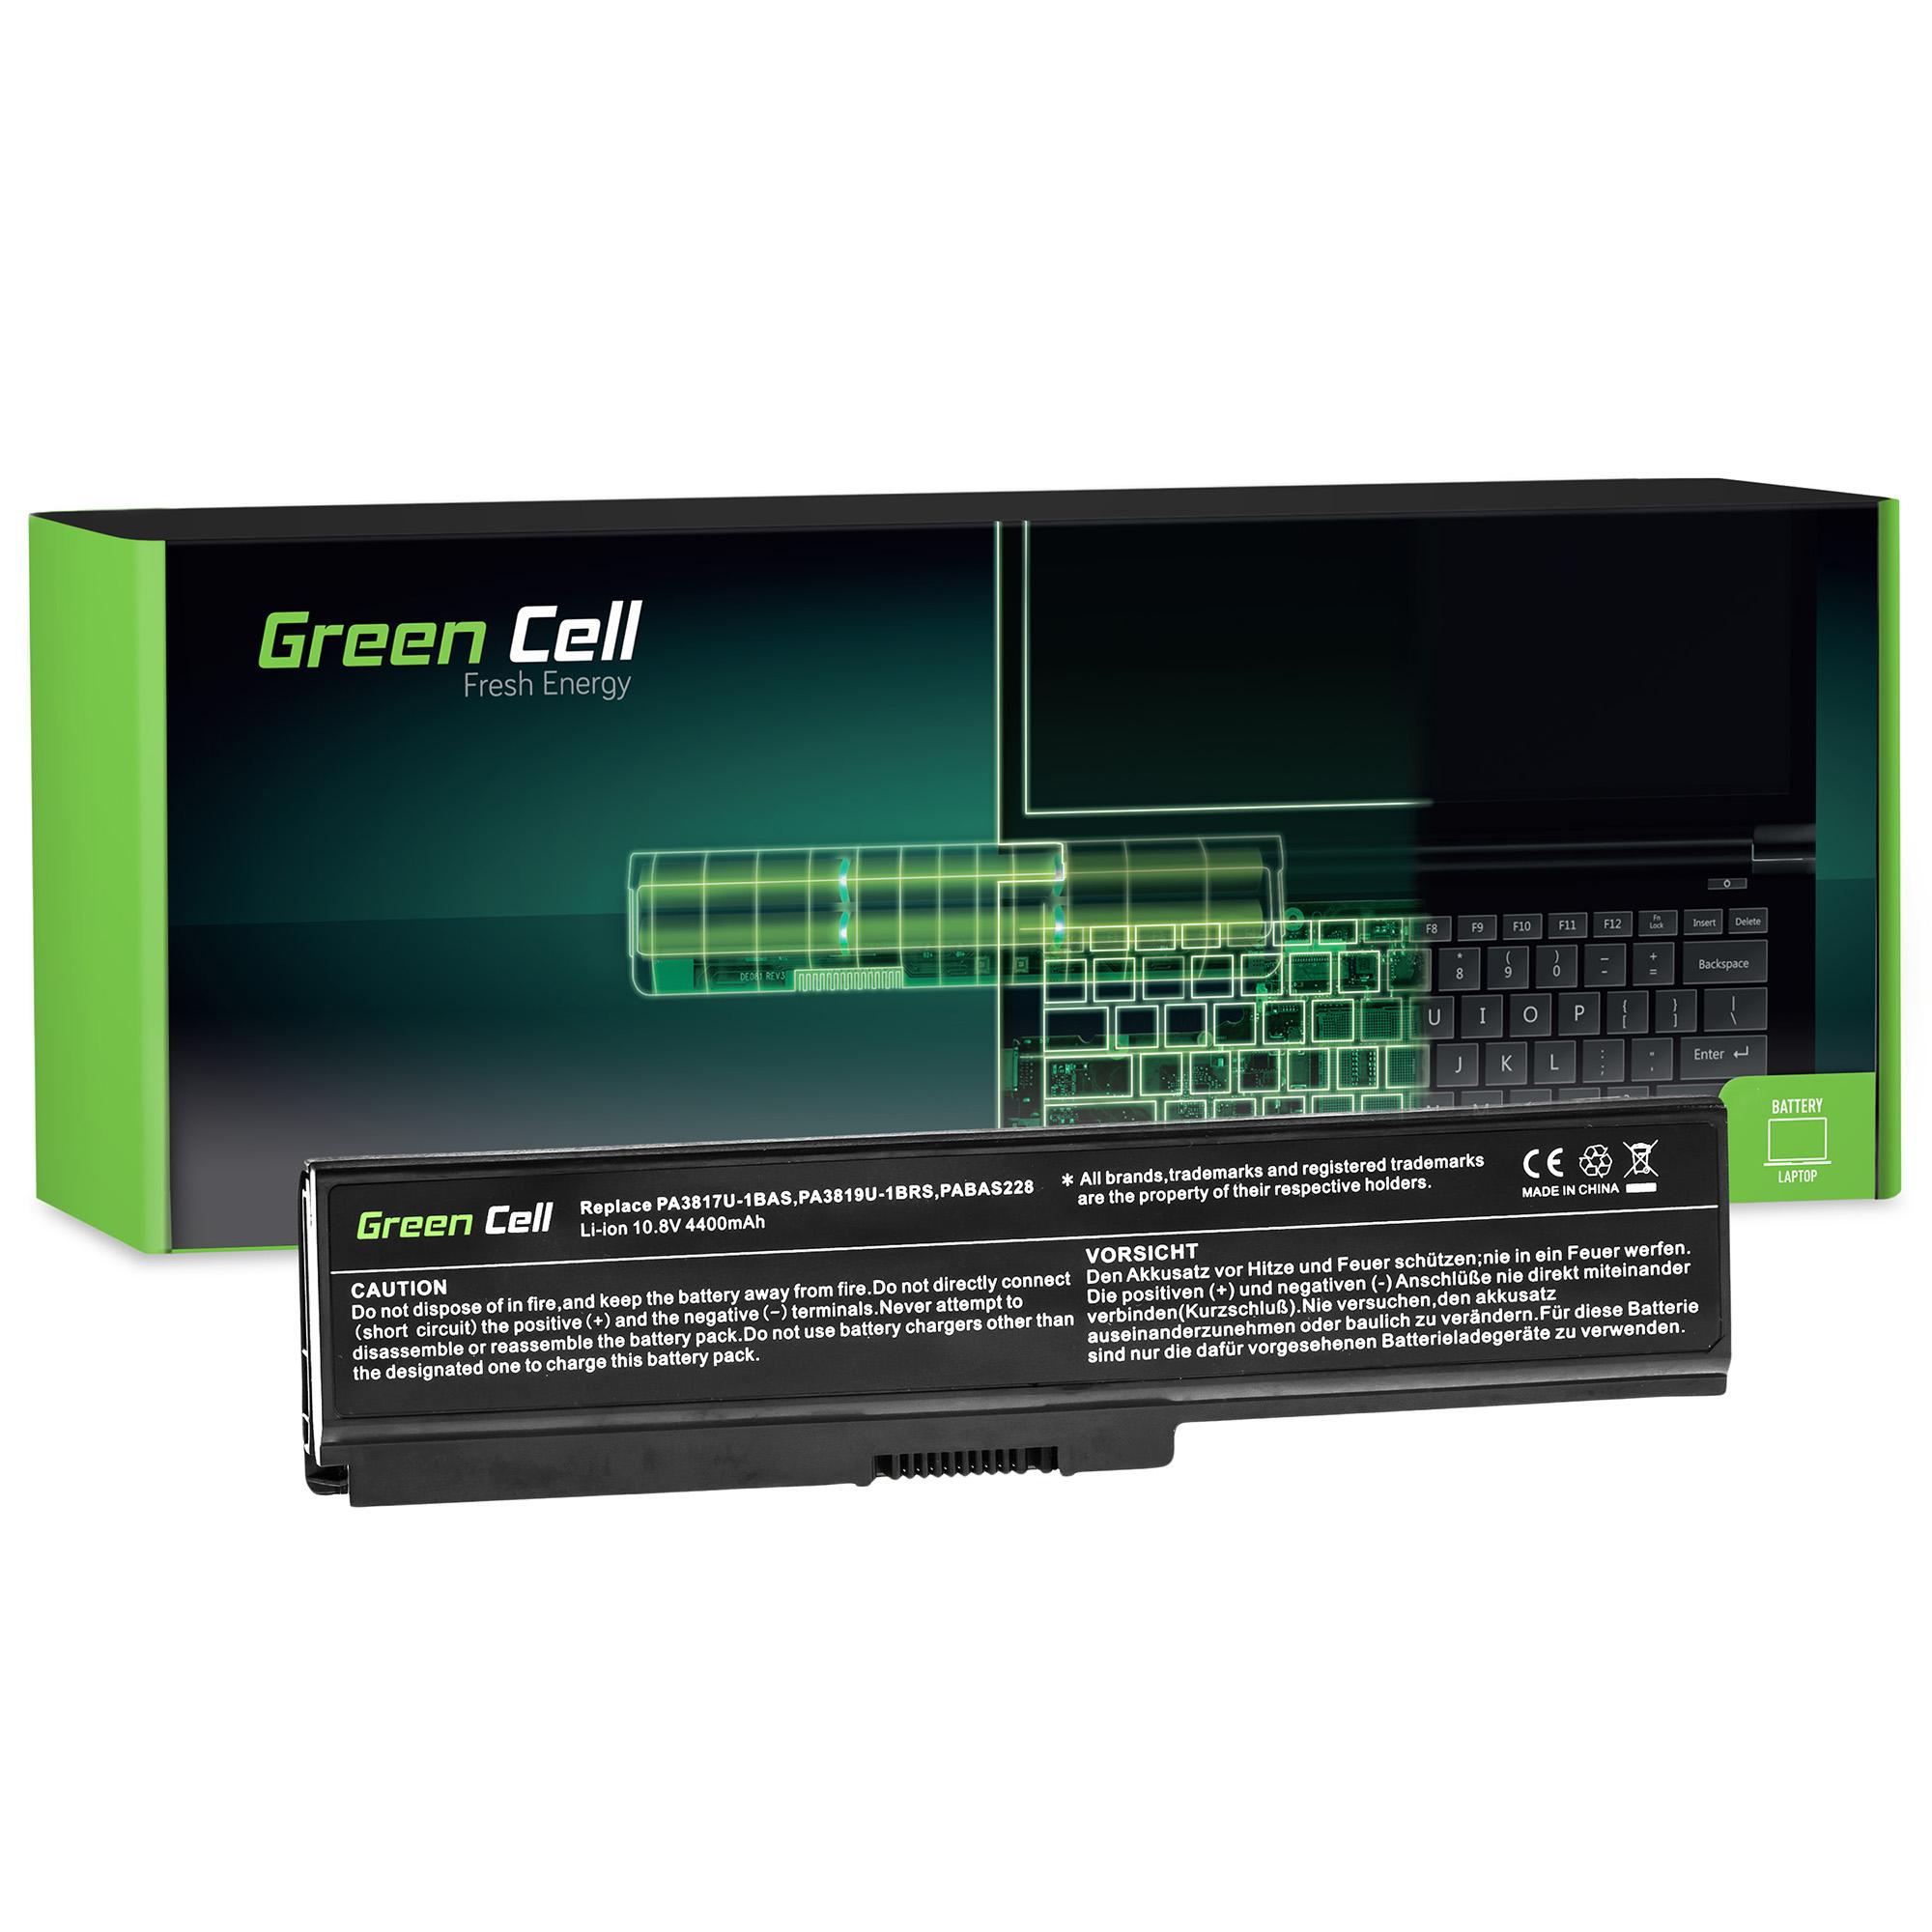 Bateria-para-Toshiba-Portege-M821-M823-M830-M822-M825-M800-10N-Ordenador-4400mAh